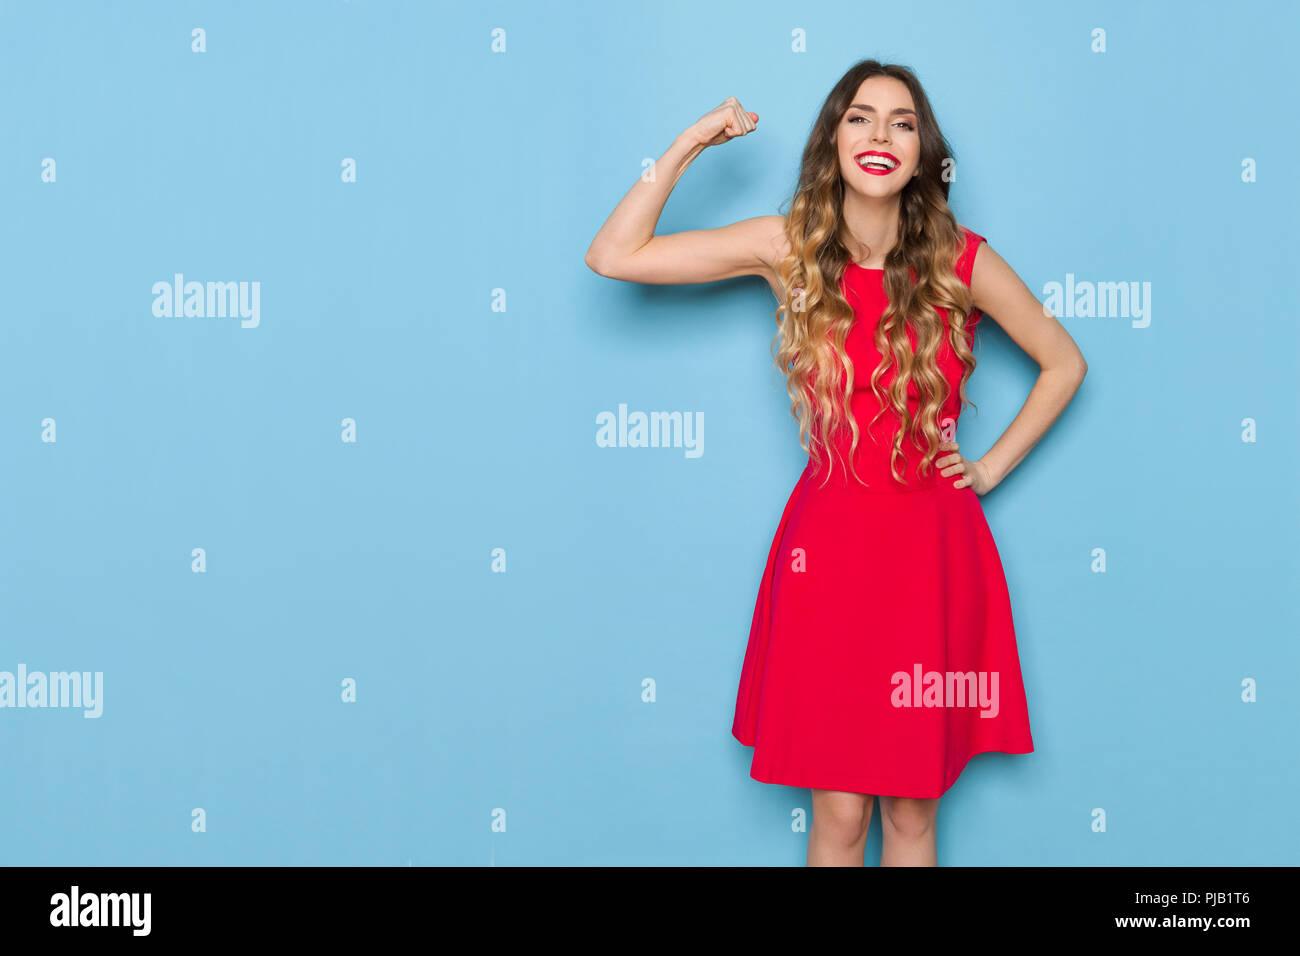 eca0d5d8641c2 Gerne schöne junge Frau im roten Kleid hält den Arm hob, lächelnd ...